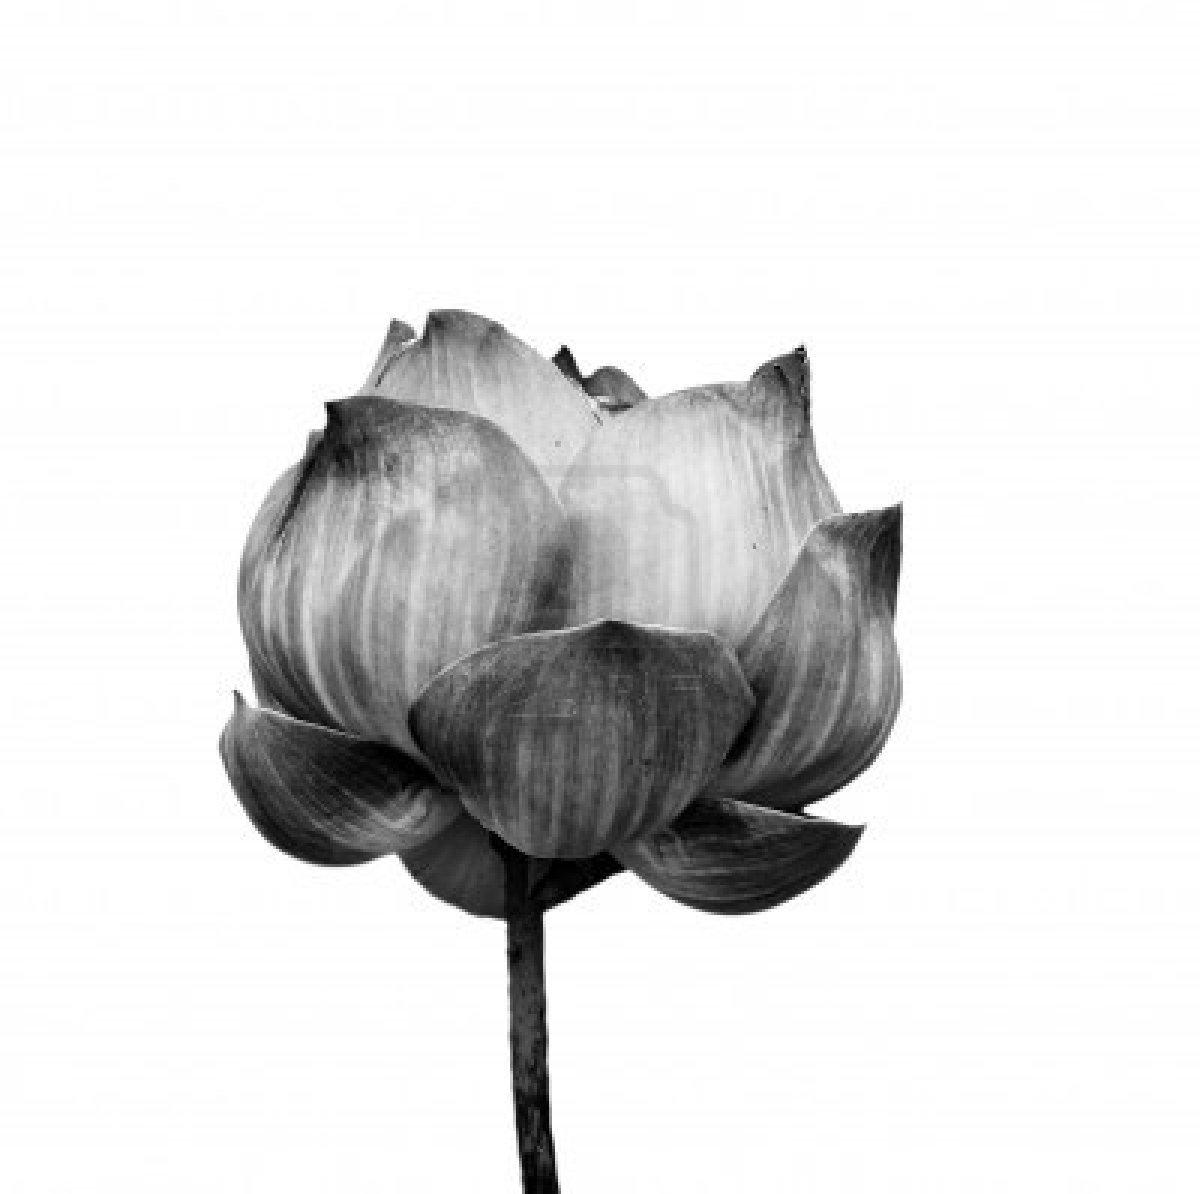 Lotus flower black and white comousar lotus flower black and white things that i like izmirmasajfo